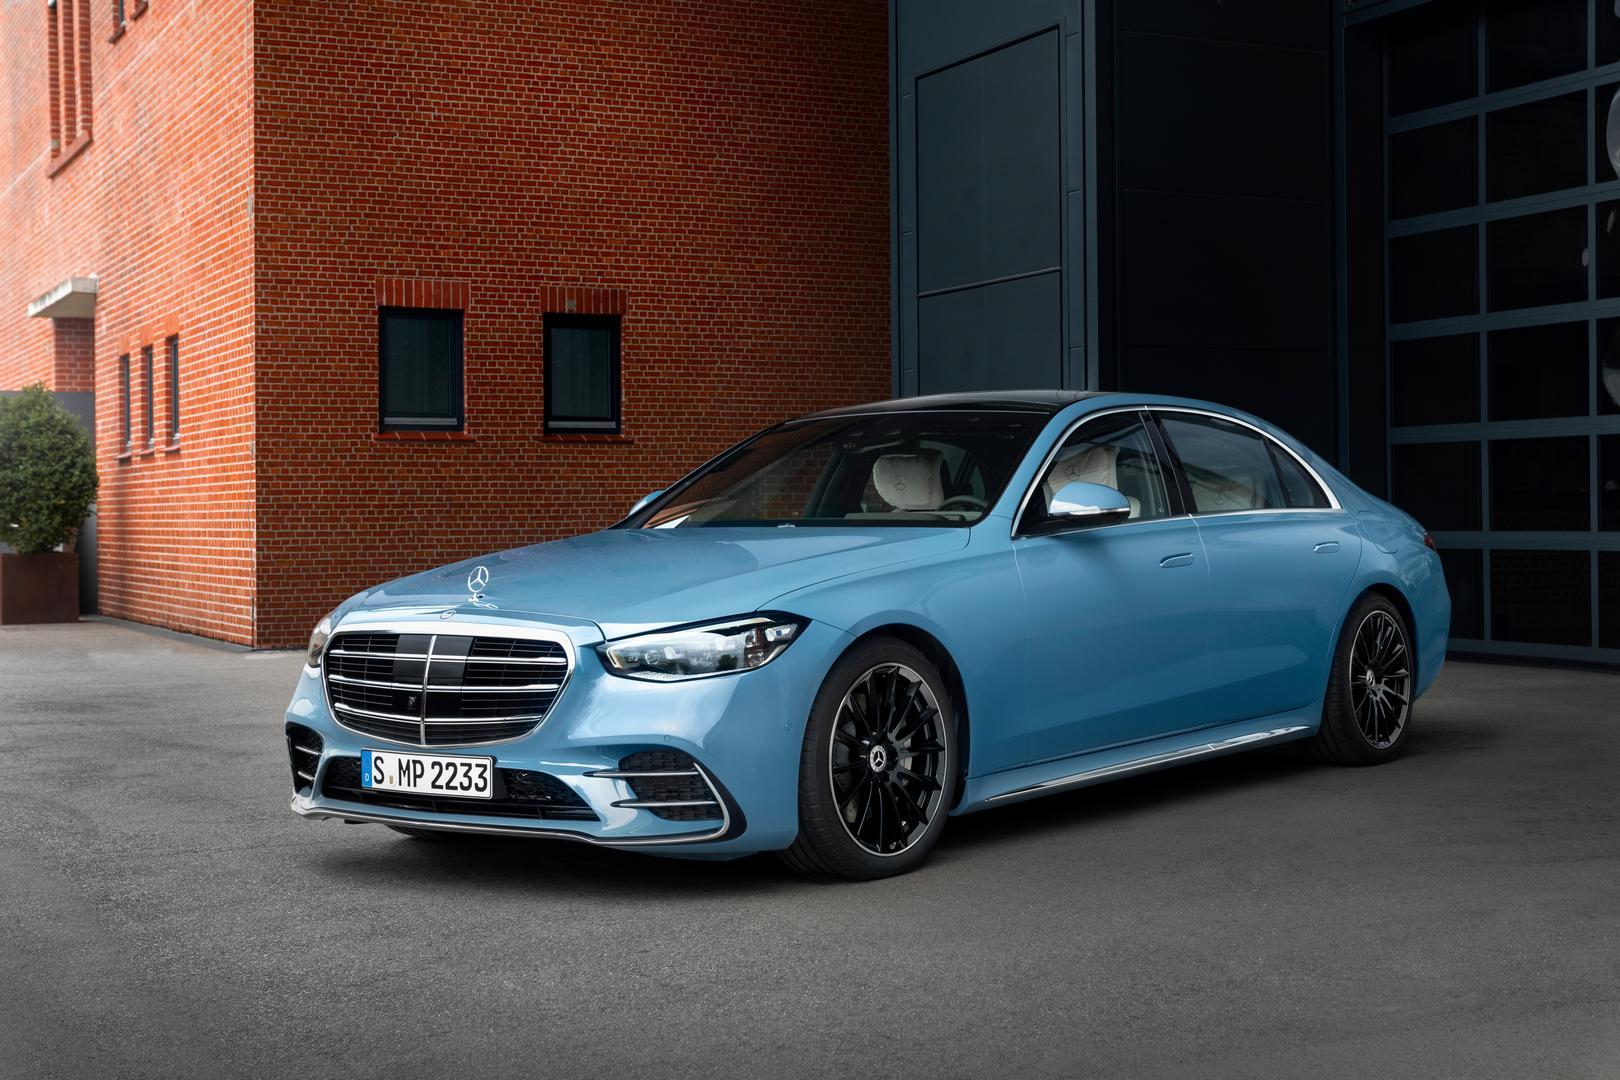 Vintage Blue Mercedes-Benz S580